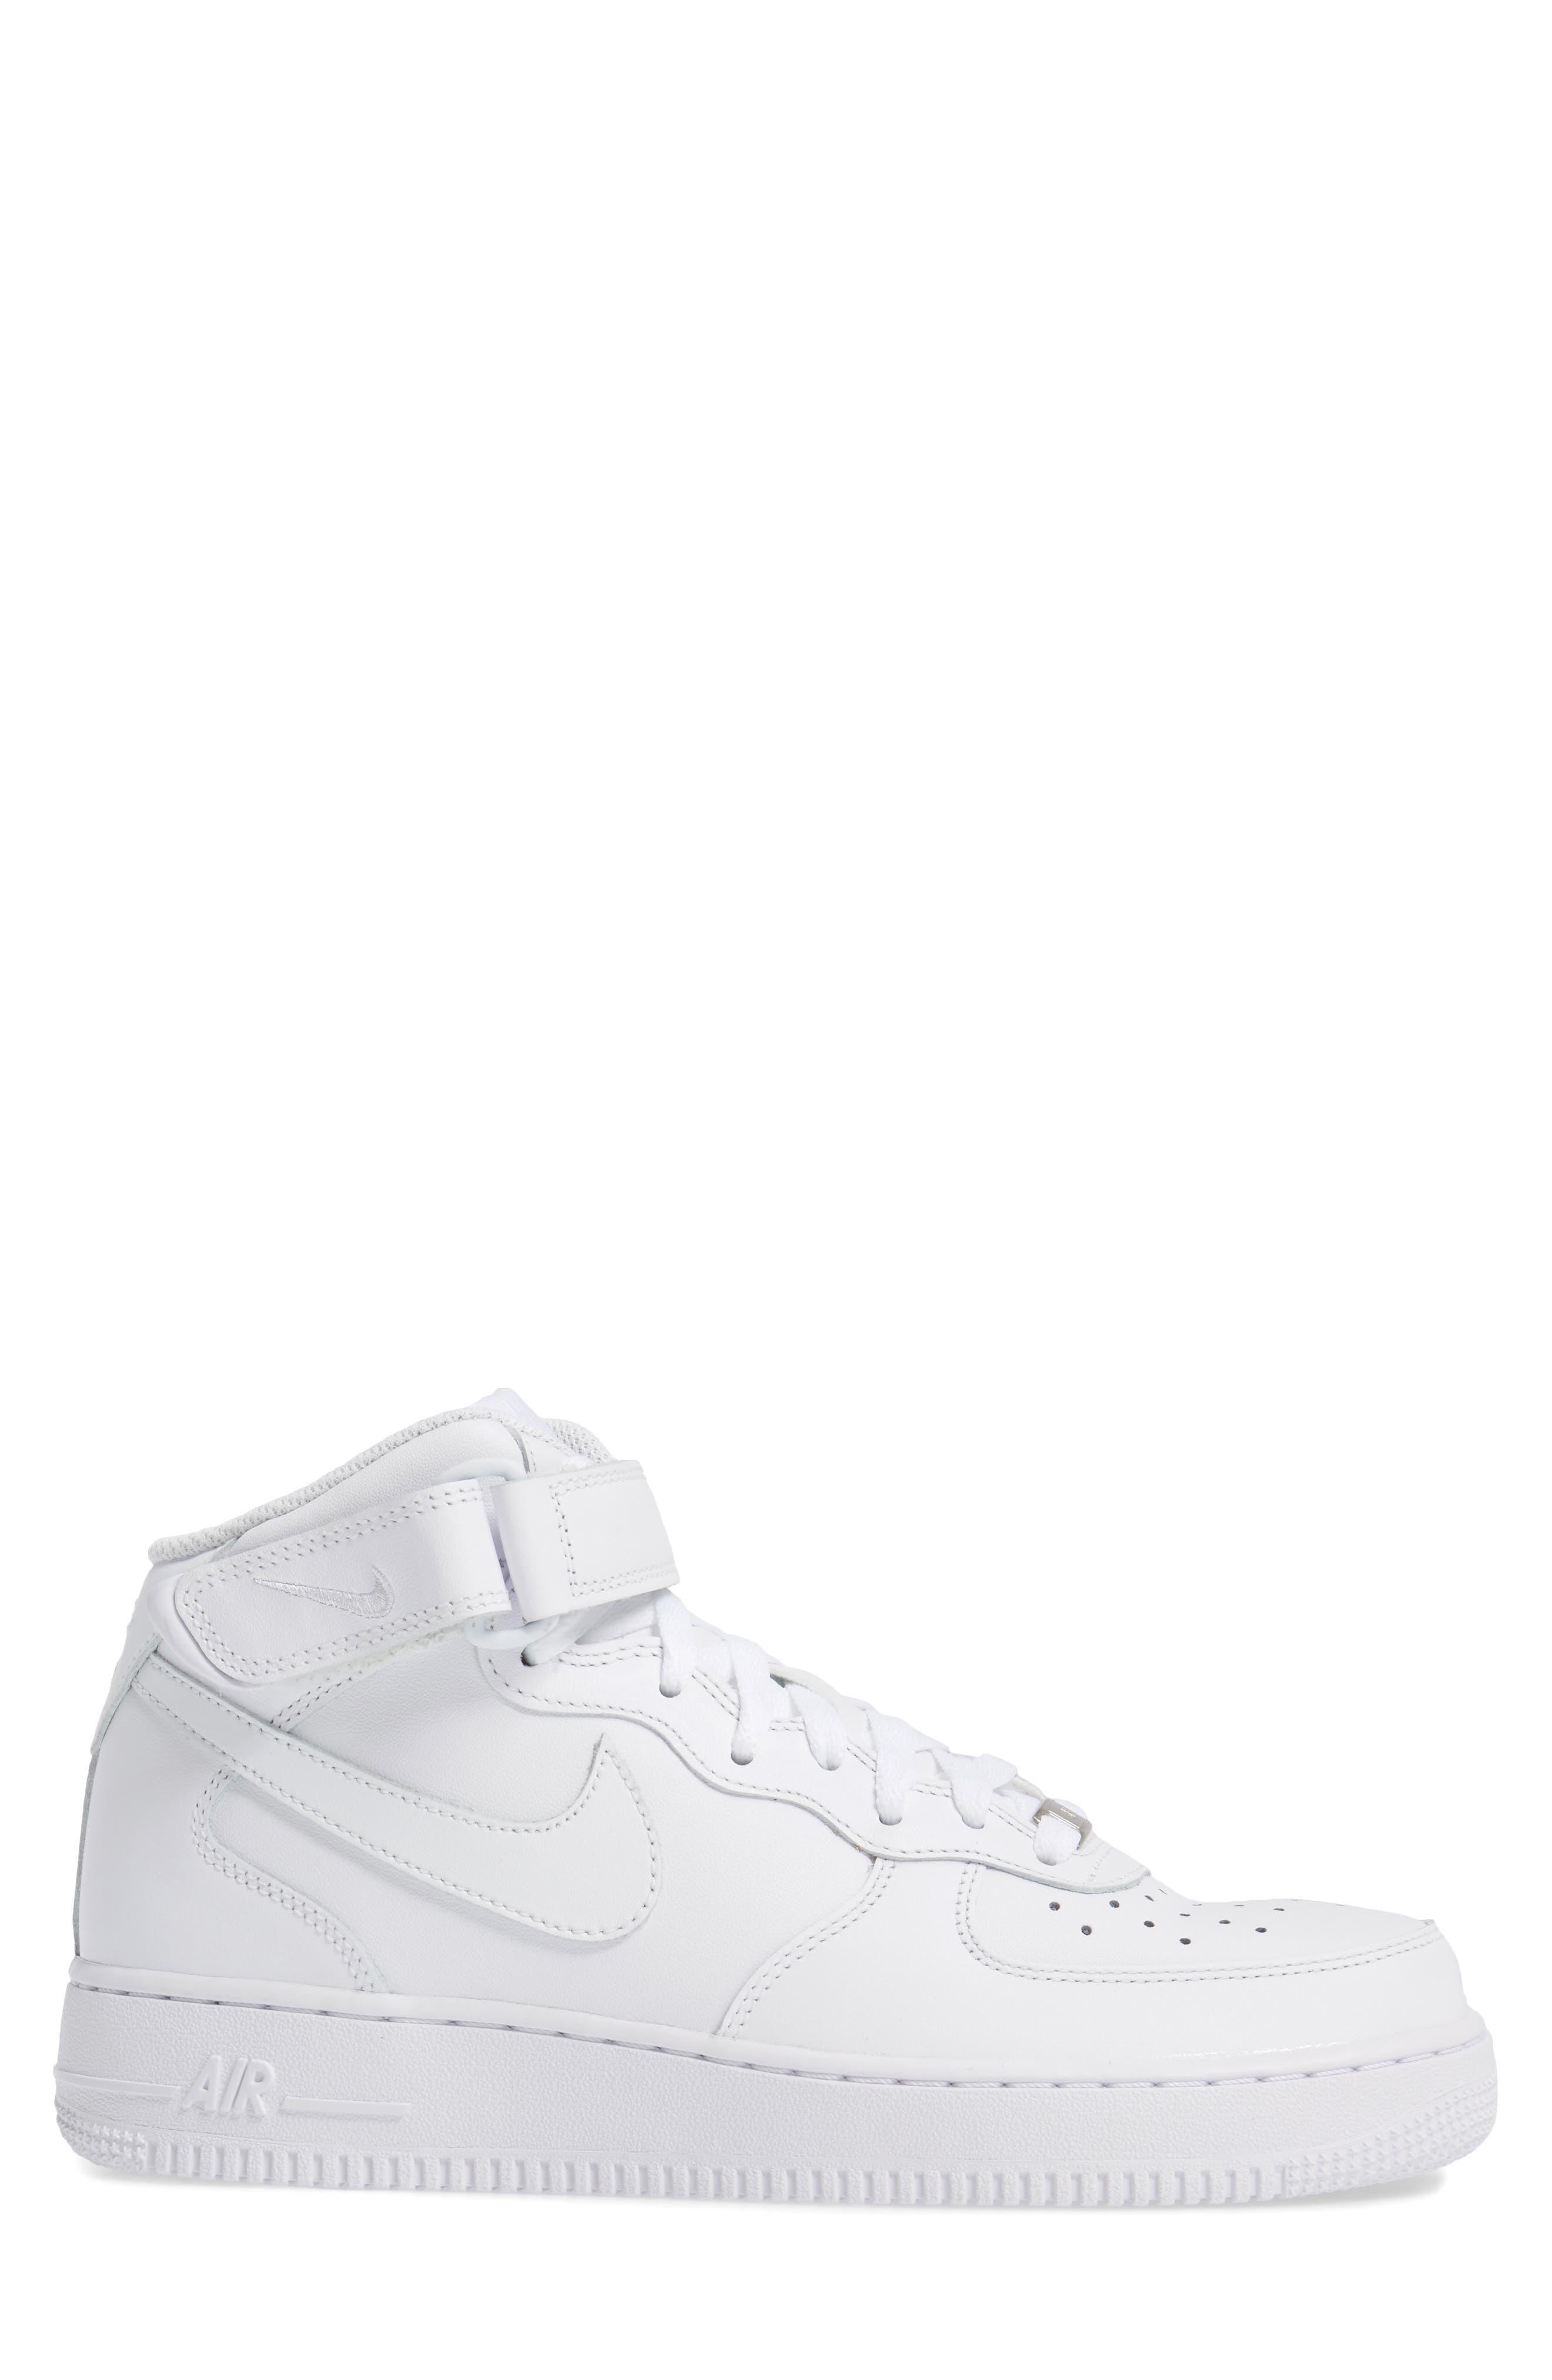 Air Force 1 Mid '07 Sneaker,                             Alternate thumbnail 3, color,                             White/ White